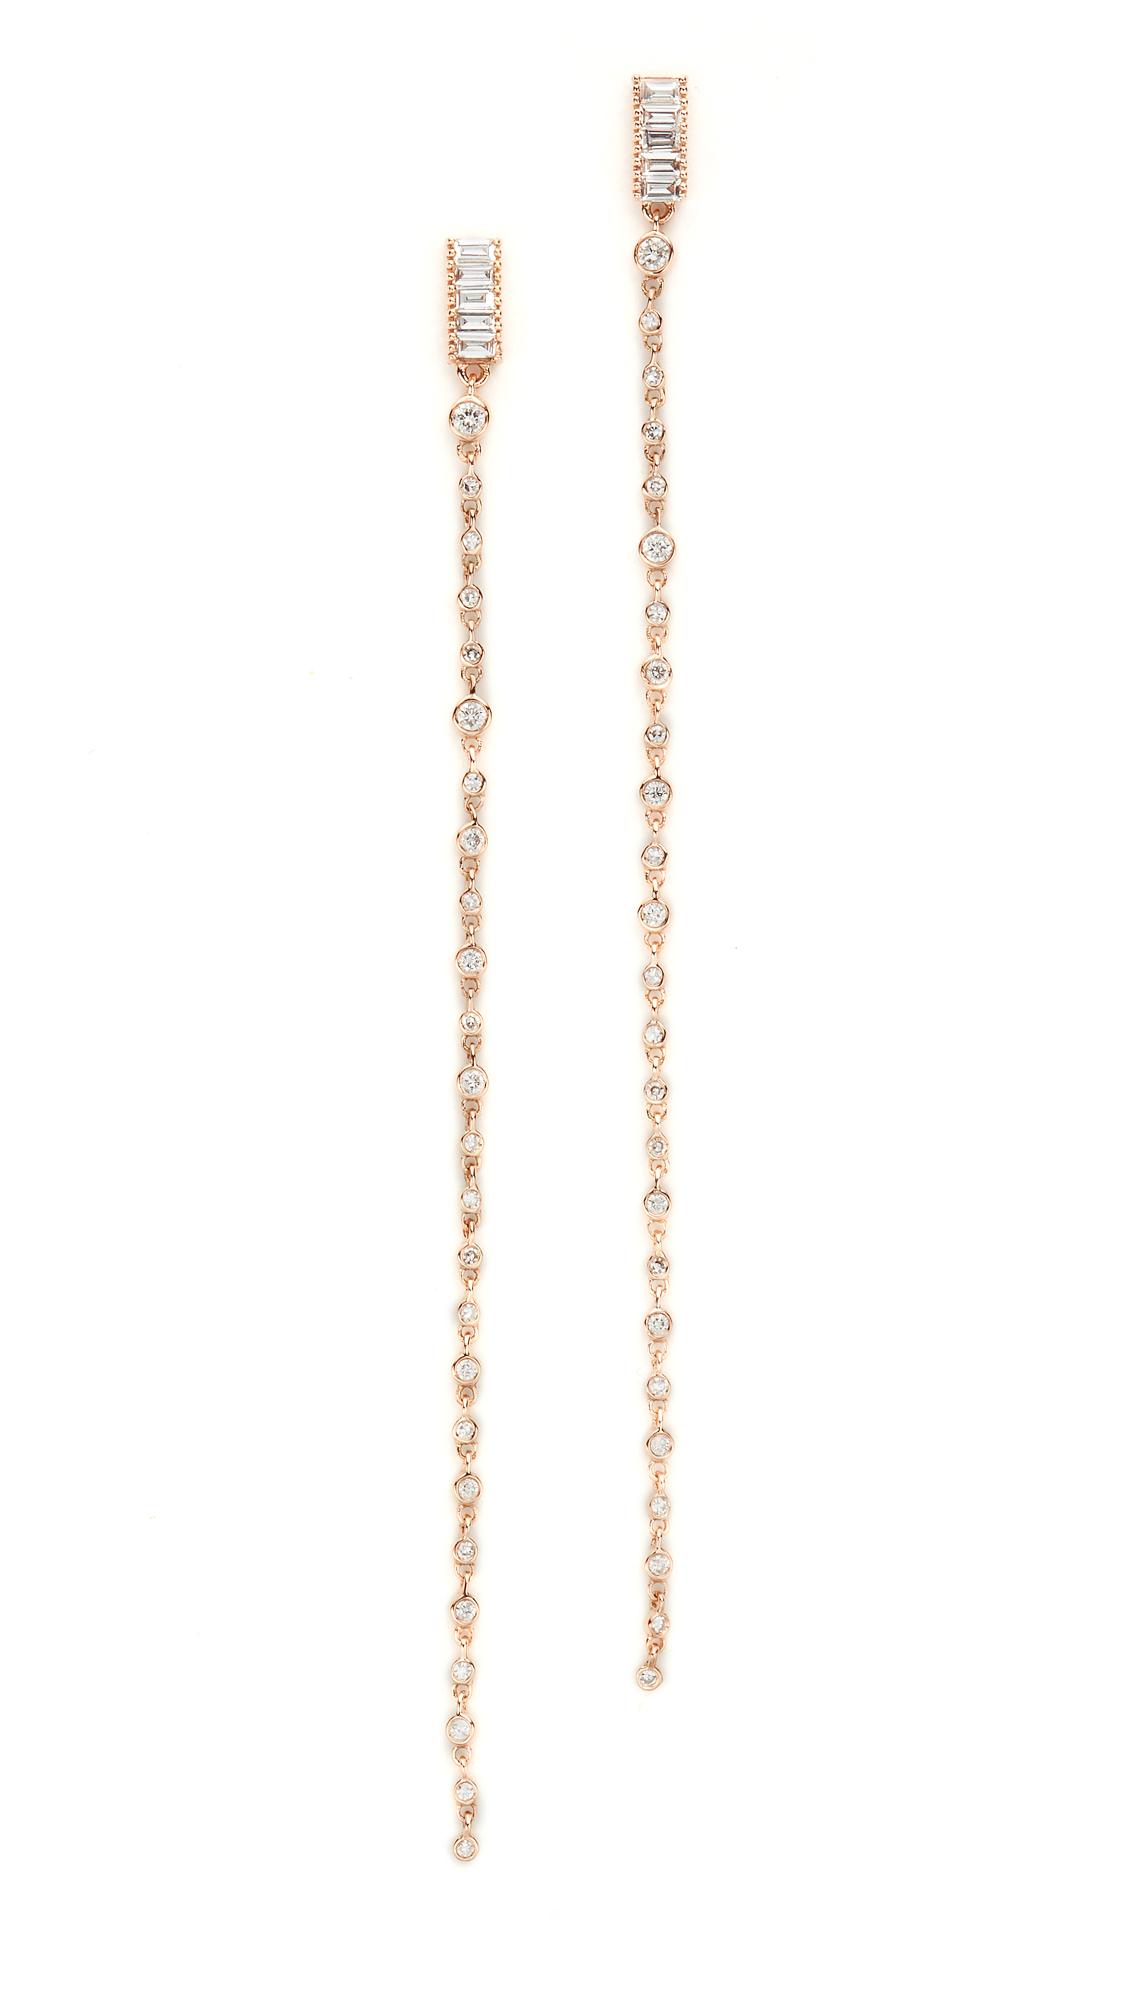 Shay 18k Gold Infinity Diamond Chain Earrings